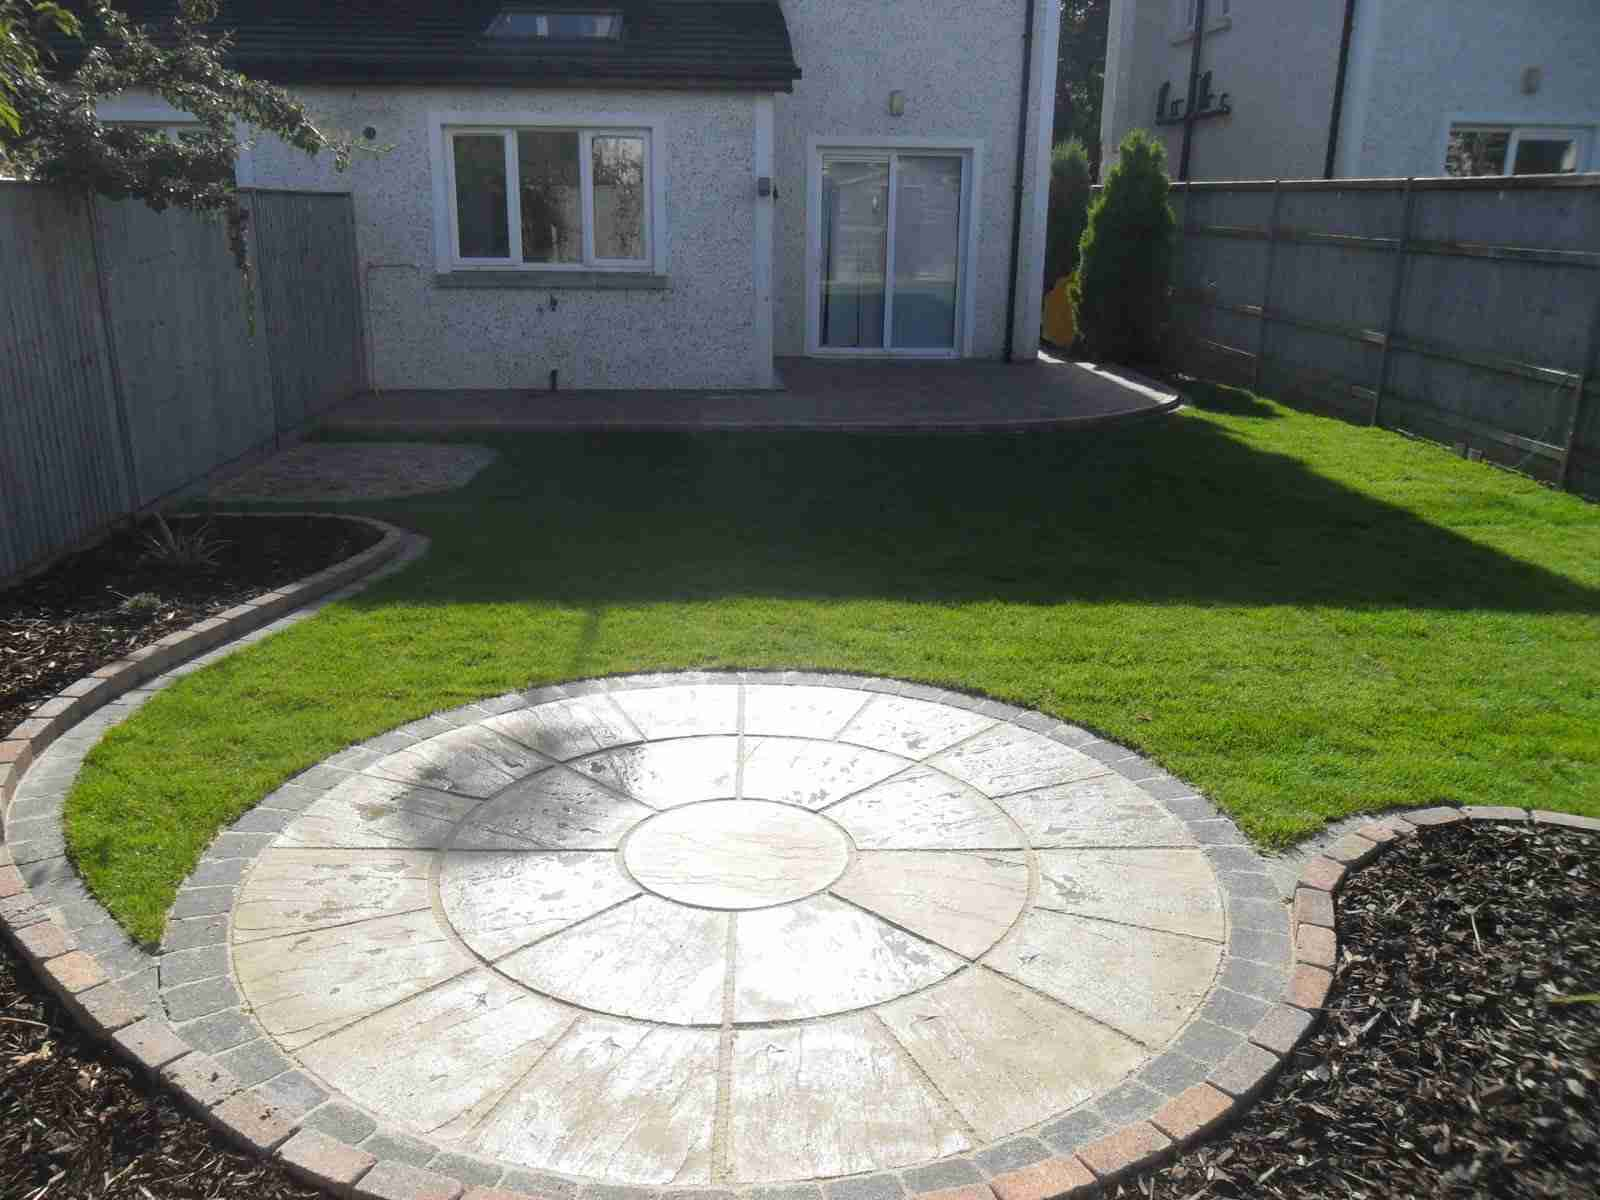 Circular Patio,Raised Patio Garden Design, Roschoill ... on Raised Patio Designs  id=82417